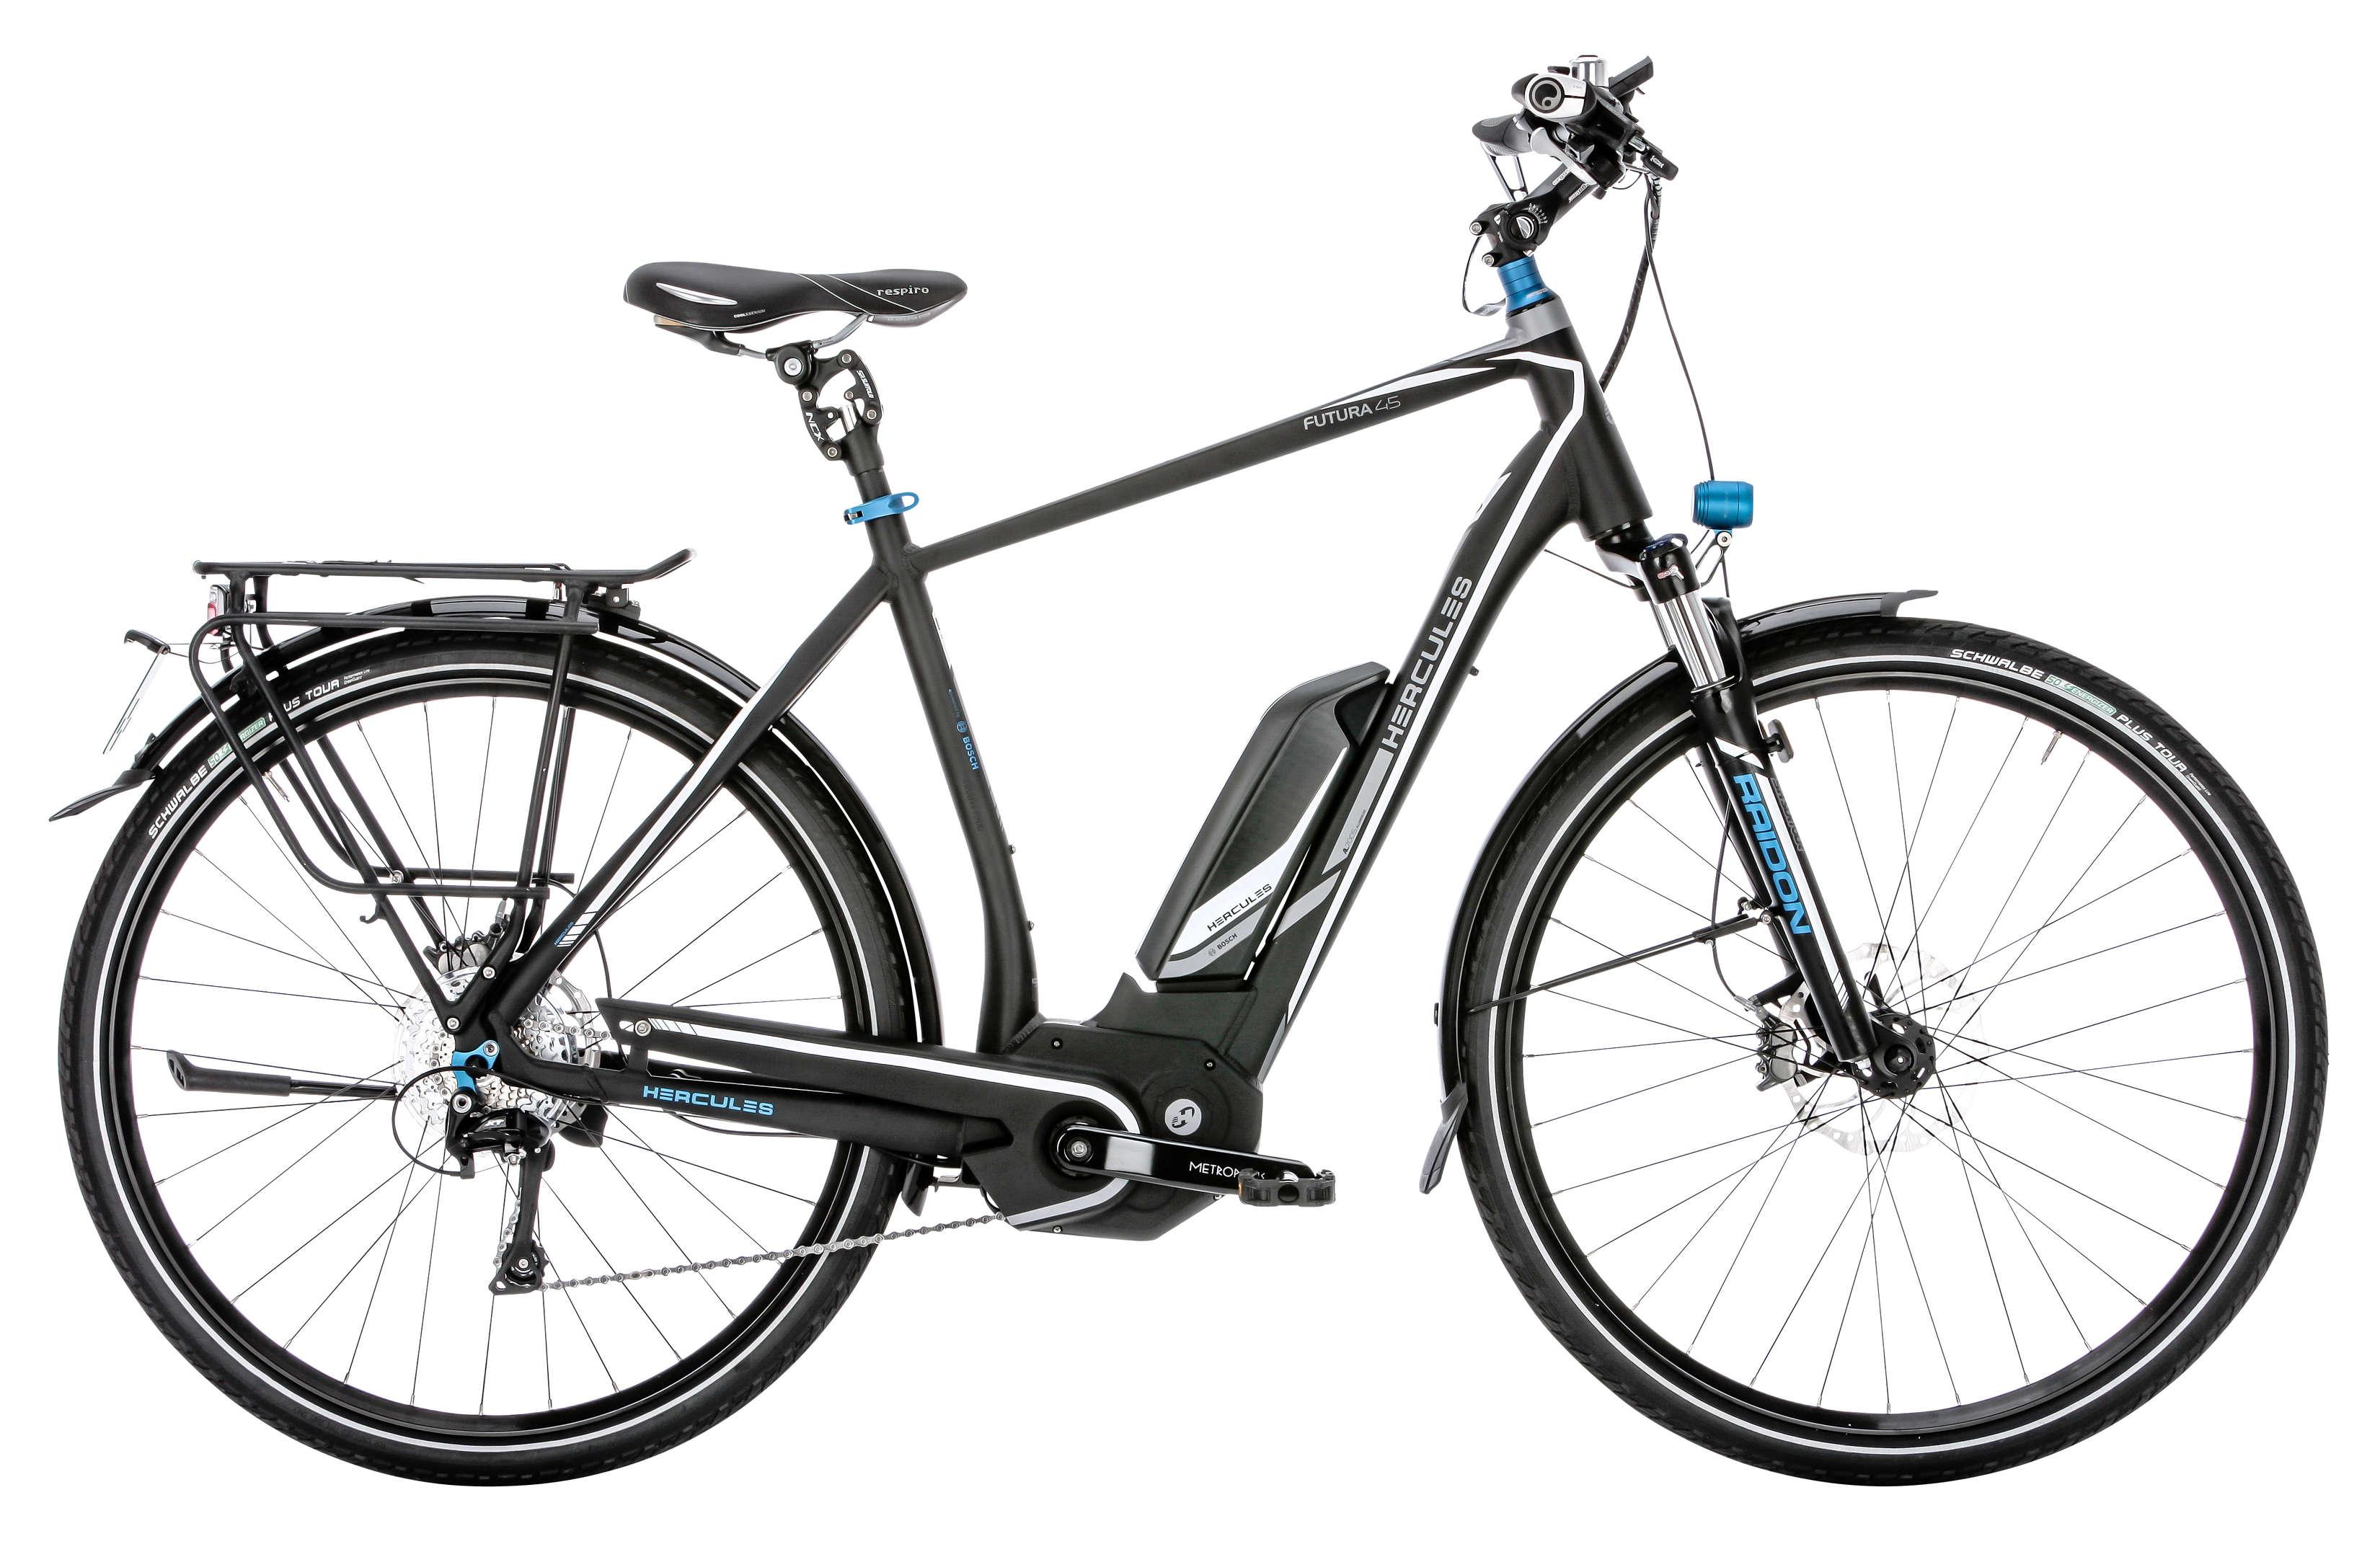 hercules e bike futura 45 eurorad bikeleasingeurorad bikeleasing. Black Bedroom Furniture Sets. Home Design Ideas